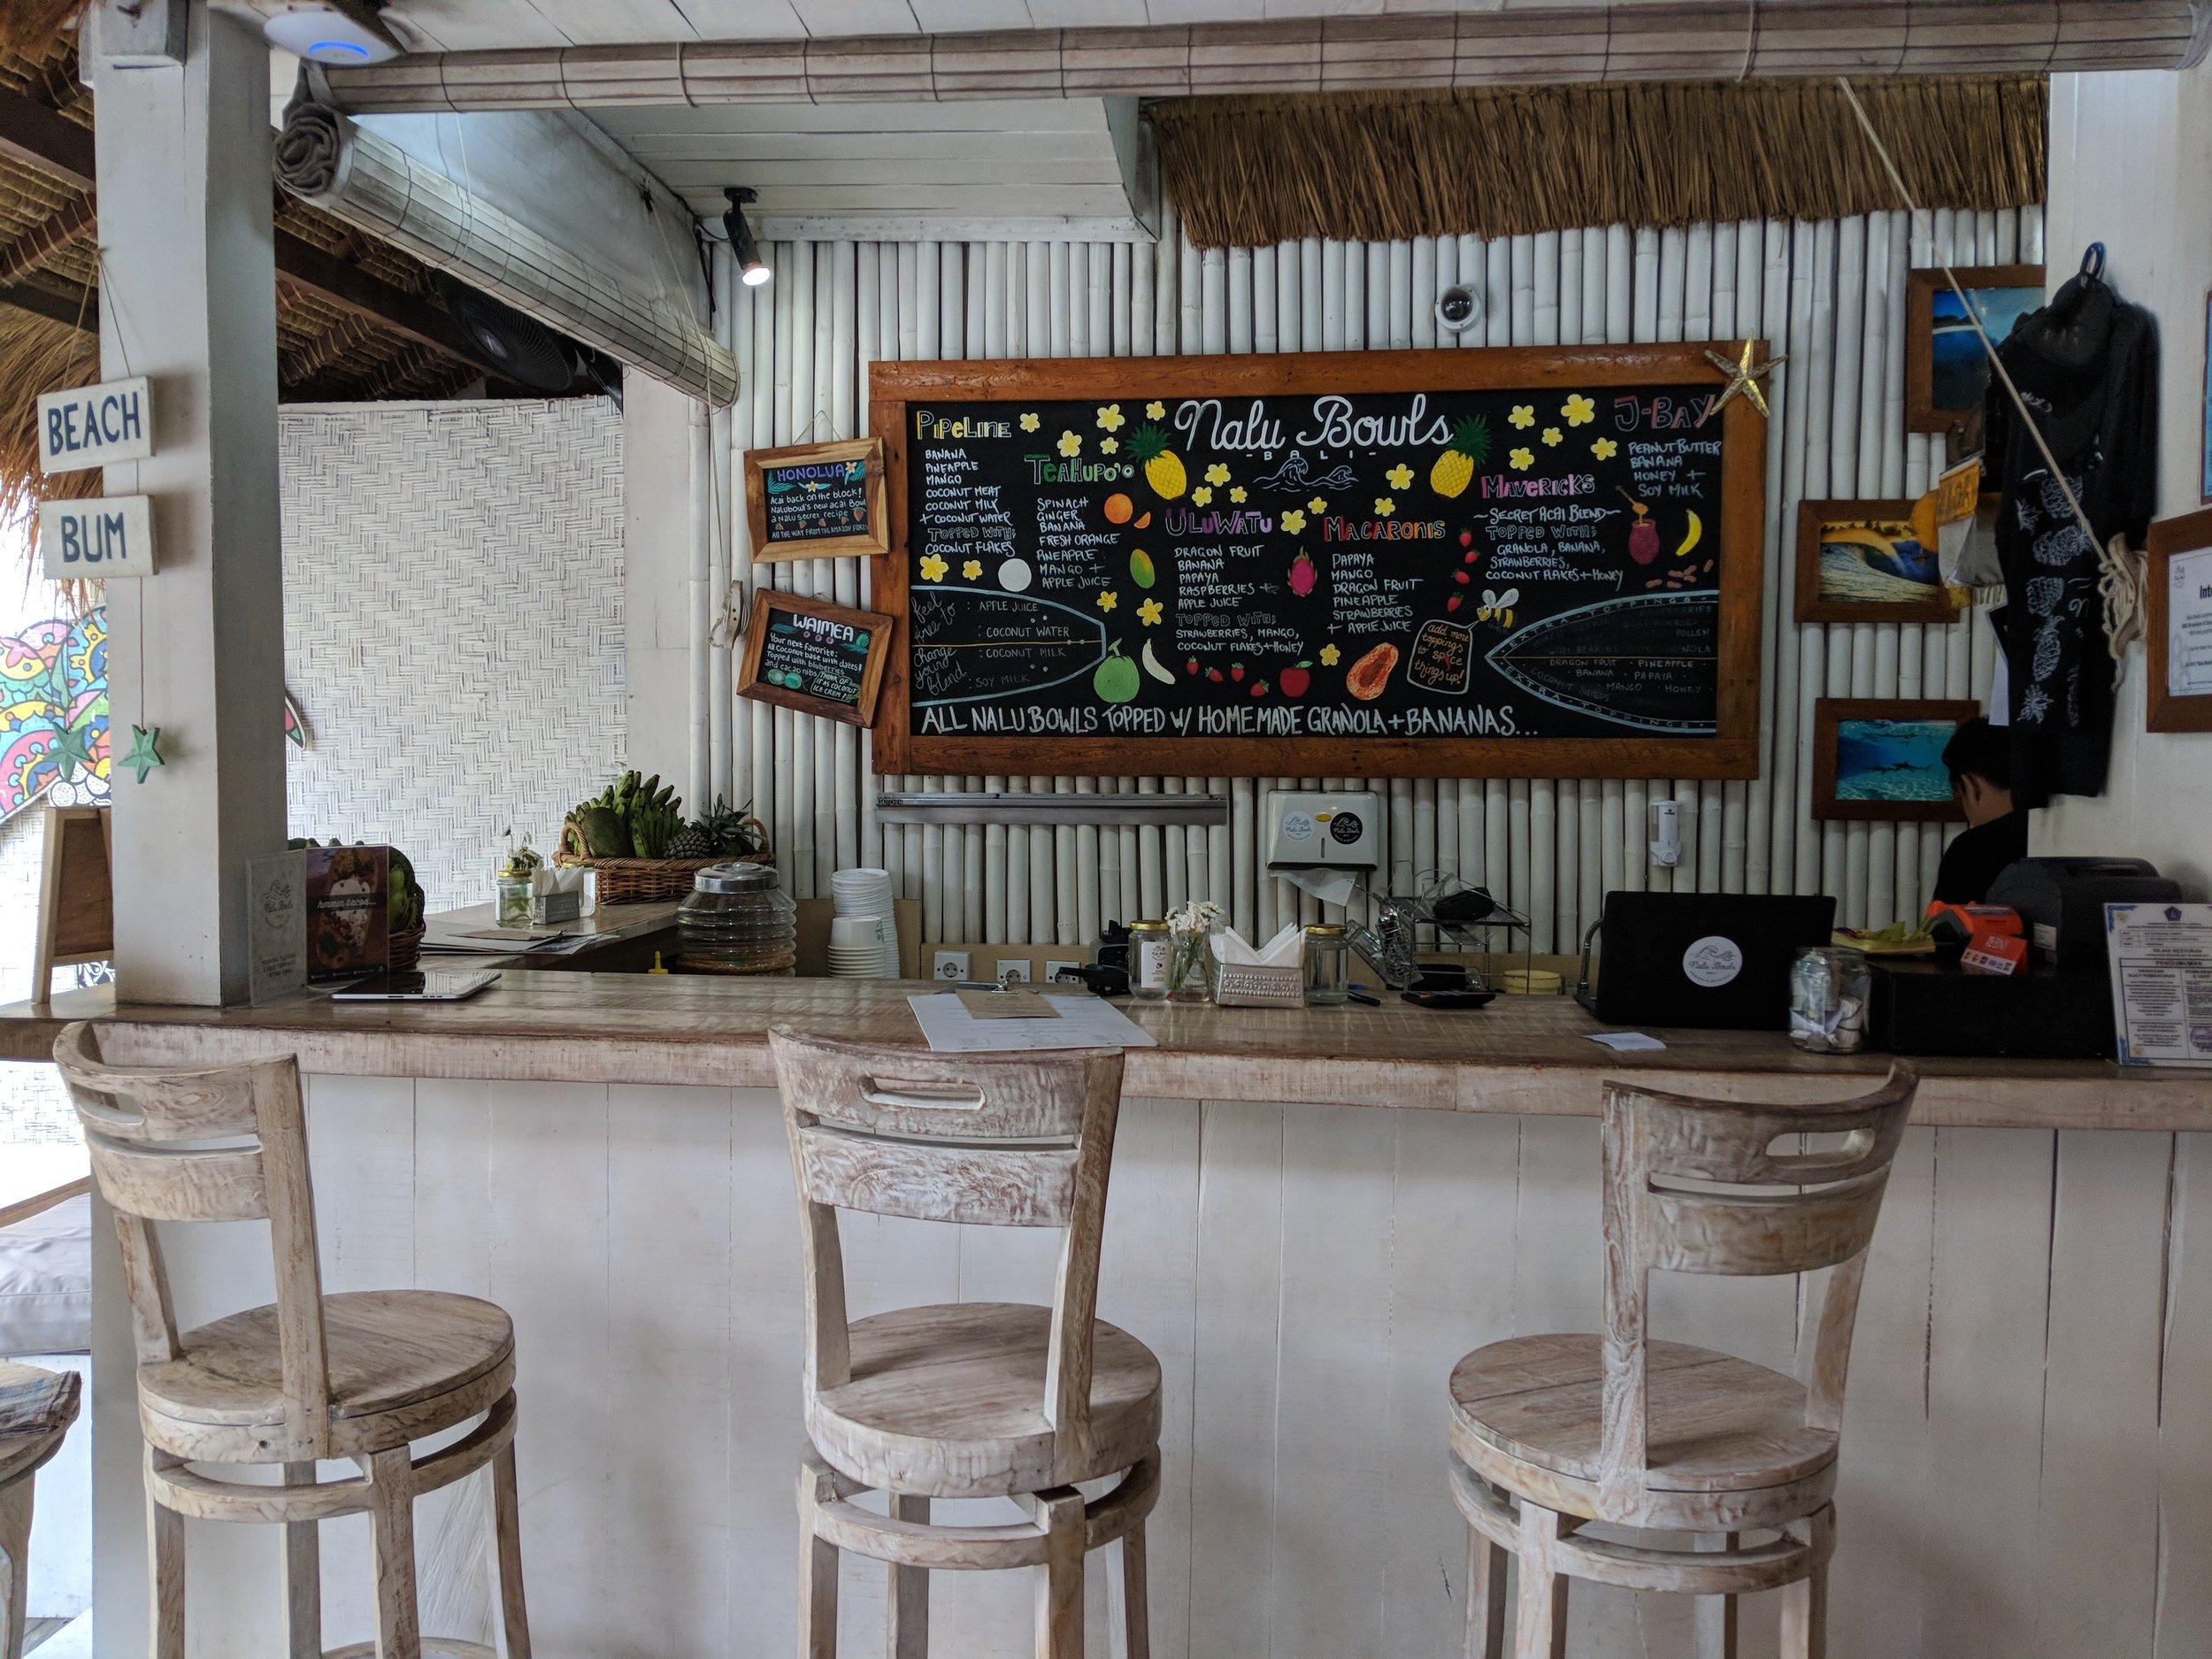 Nalu Bowls Bali